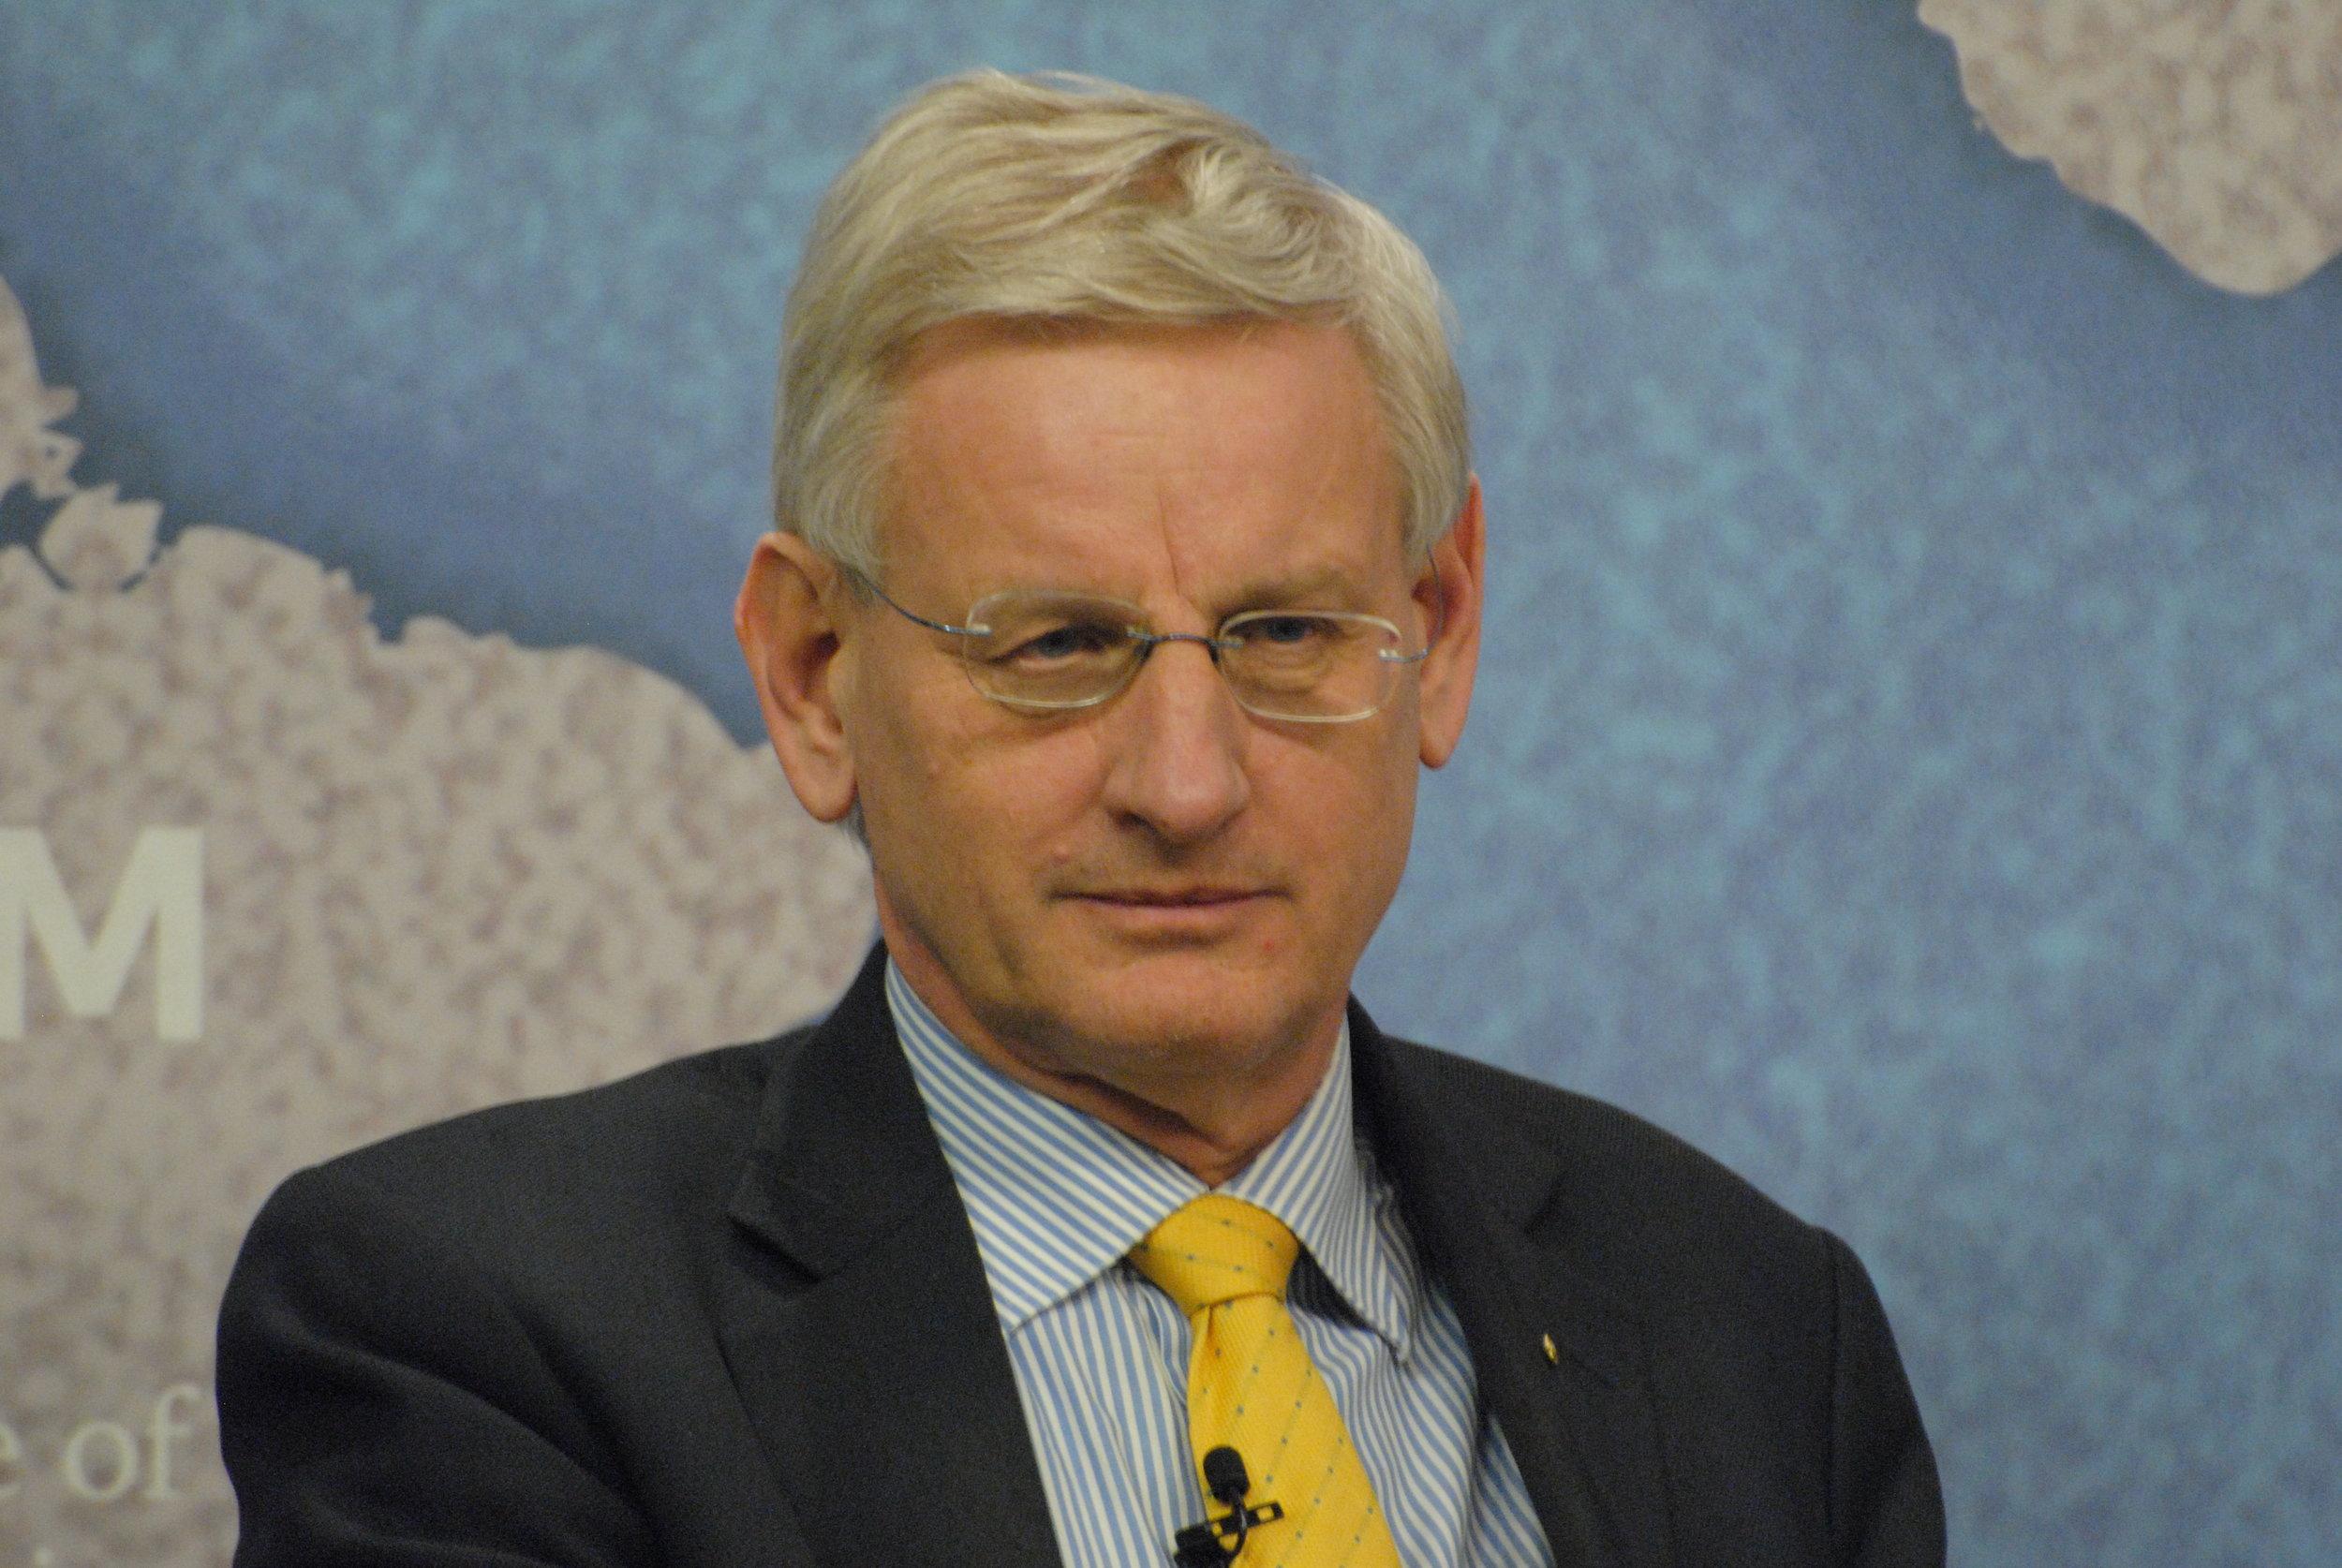 Carl Bildt - Rootsi peaminister, välisminister